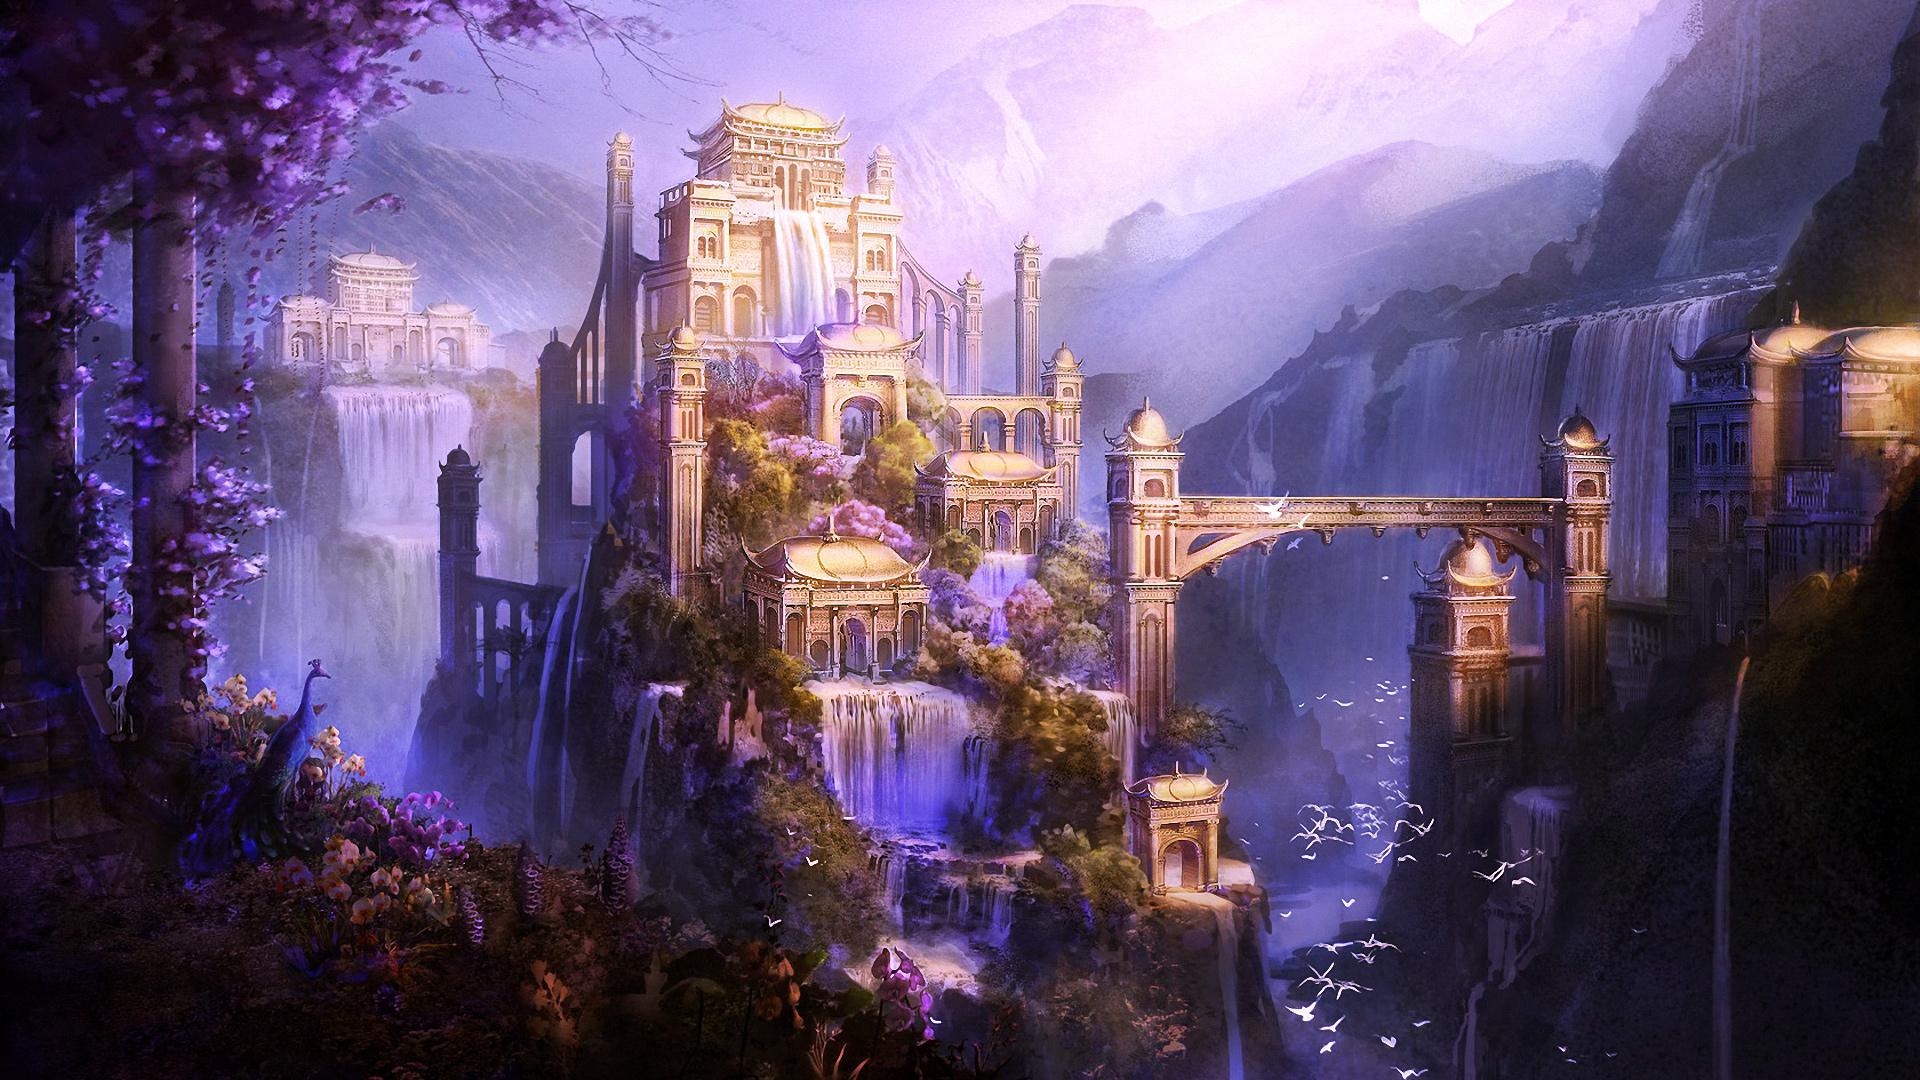 Magical castle wallpaper